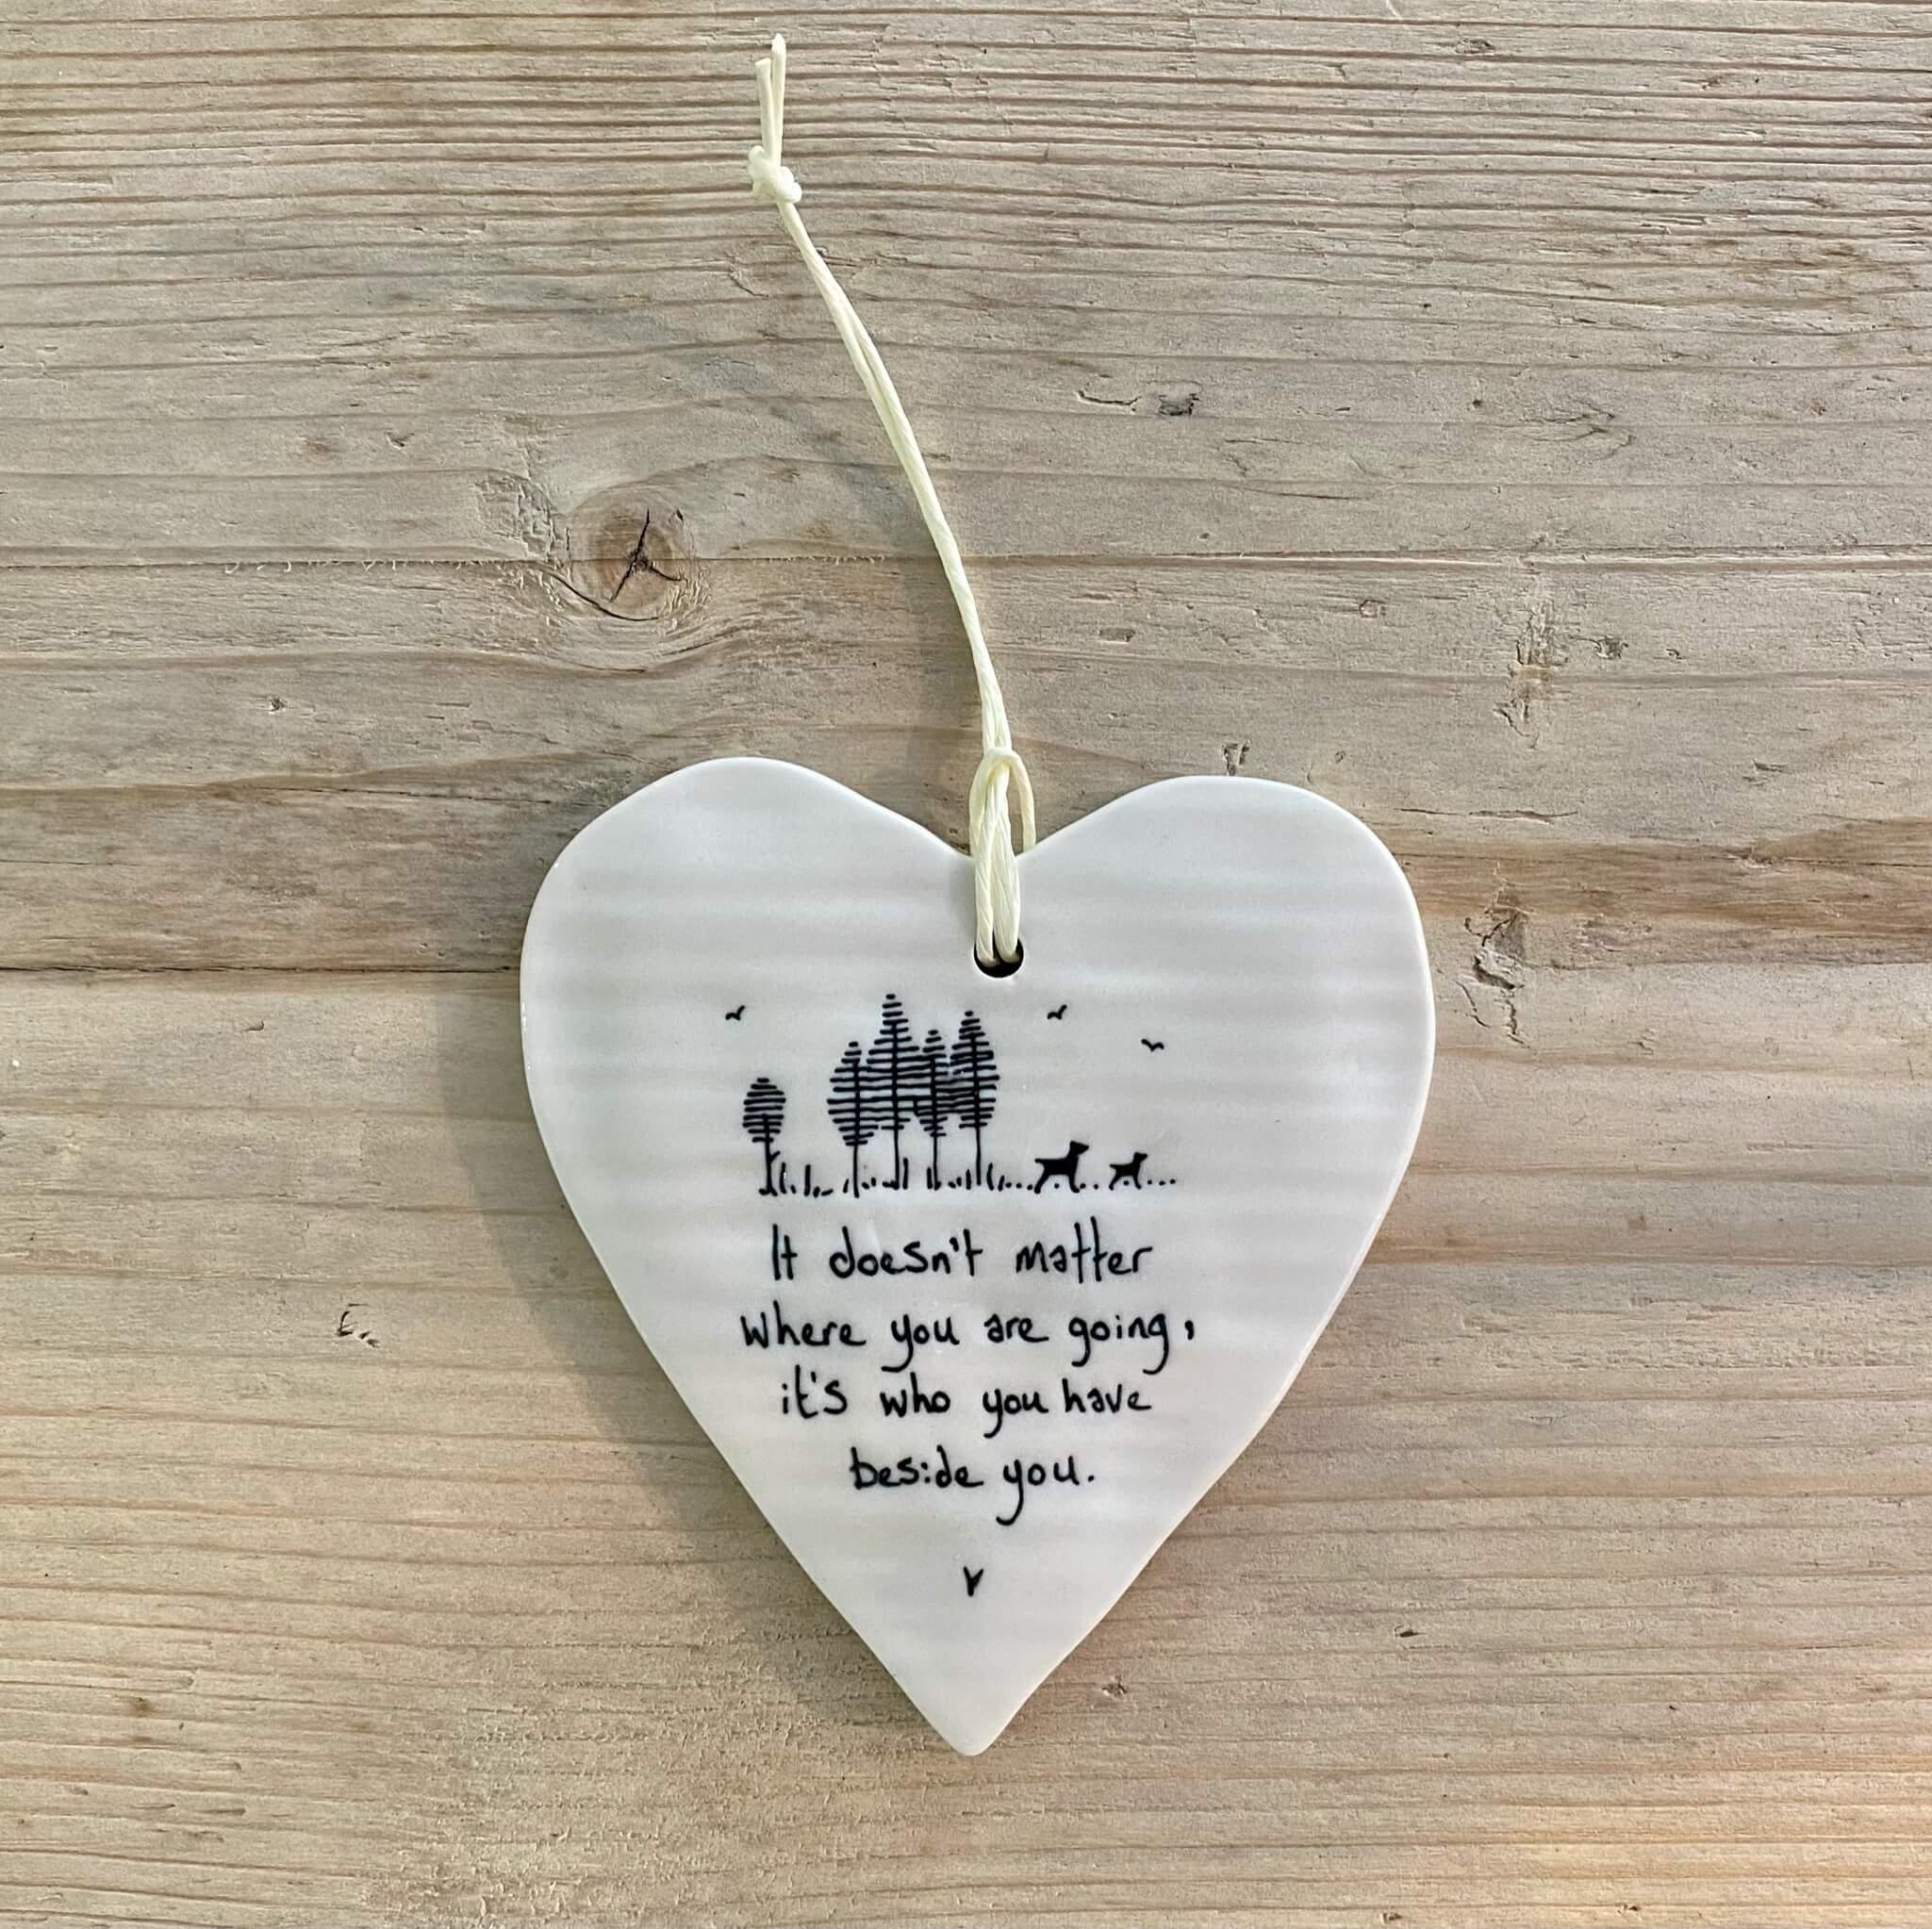 Porclain Heart - It doesn't matter